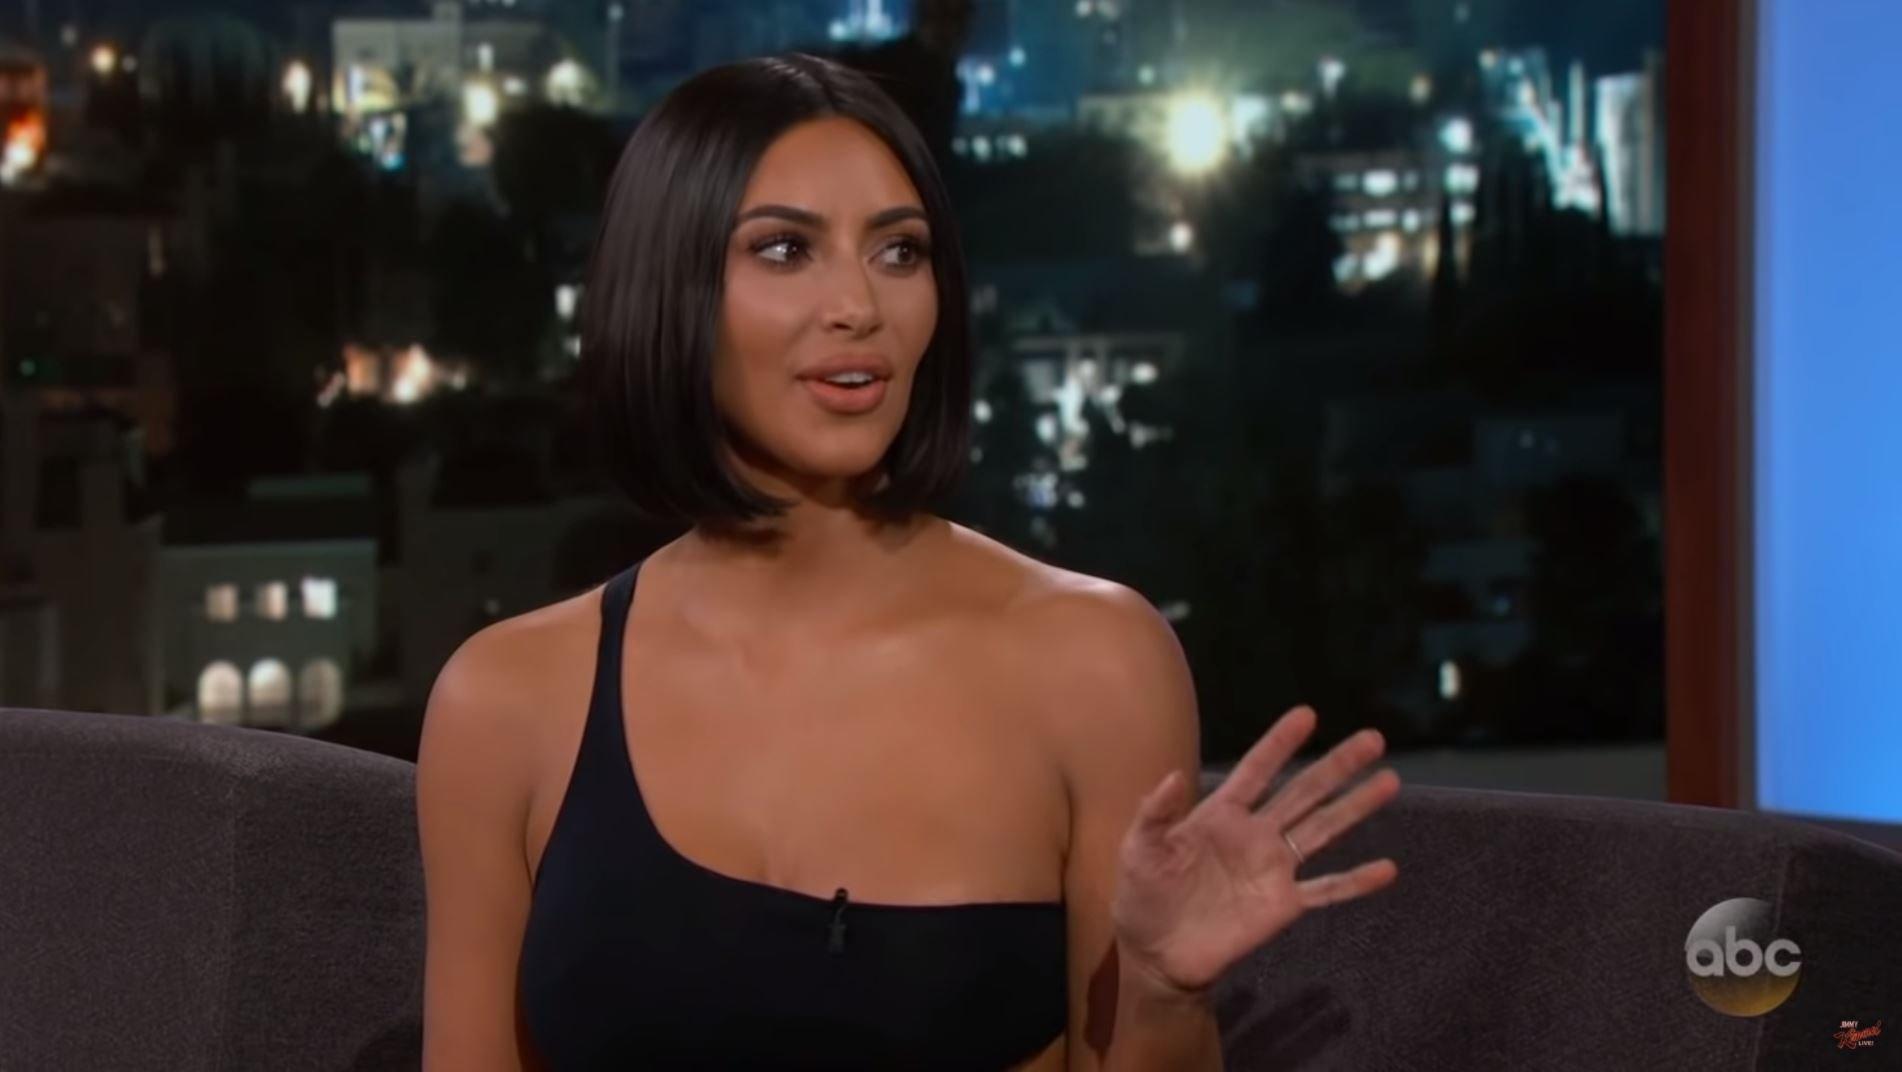 Kim Kardashian jokes about Kylie Jenner's 'billionaire' Forbes cover